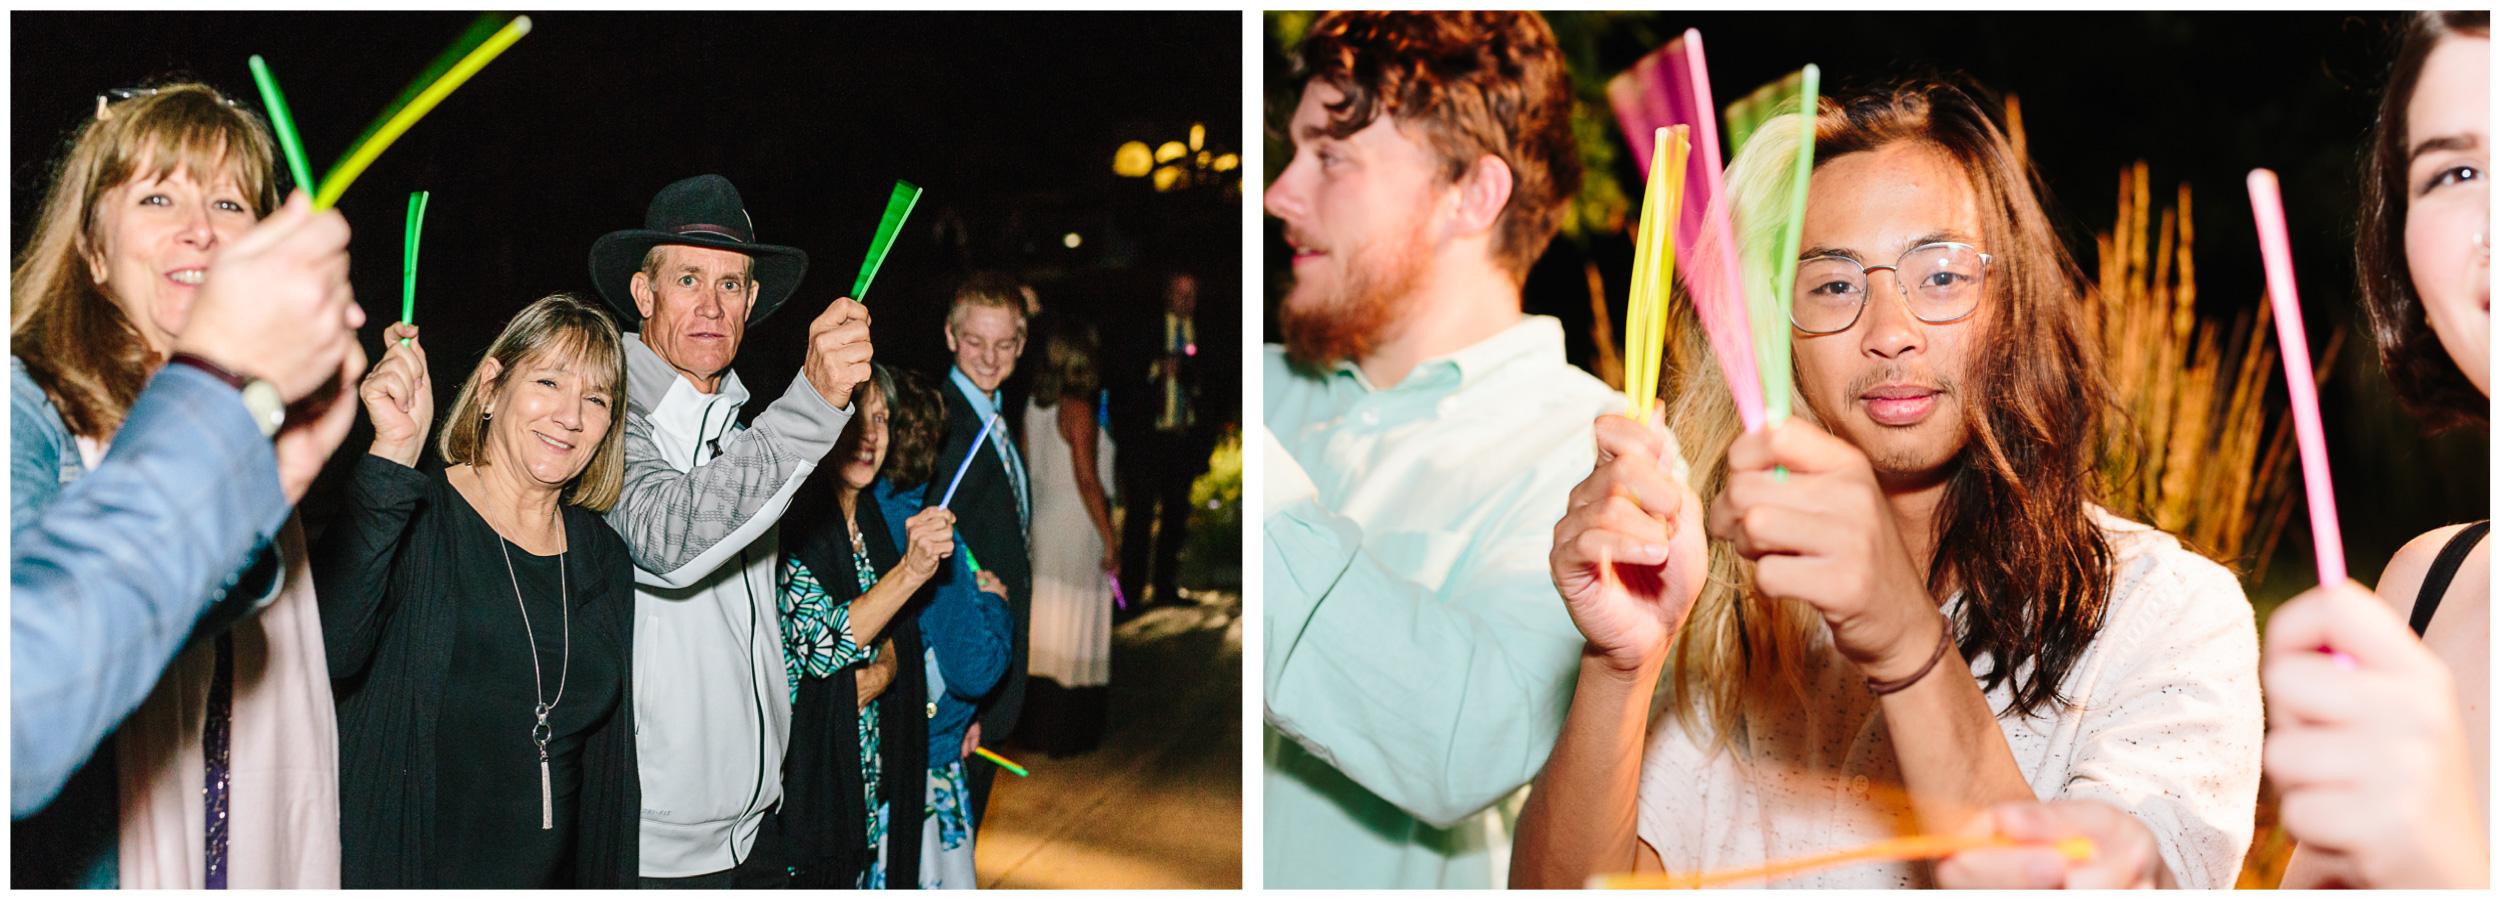 littleton_wedding_80.jpg